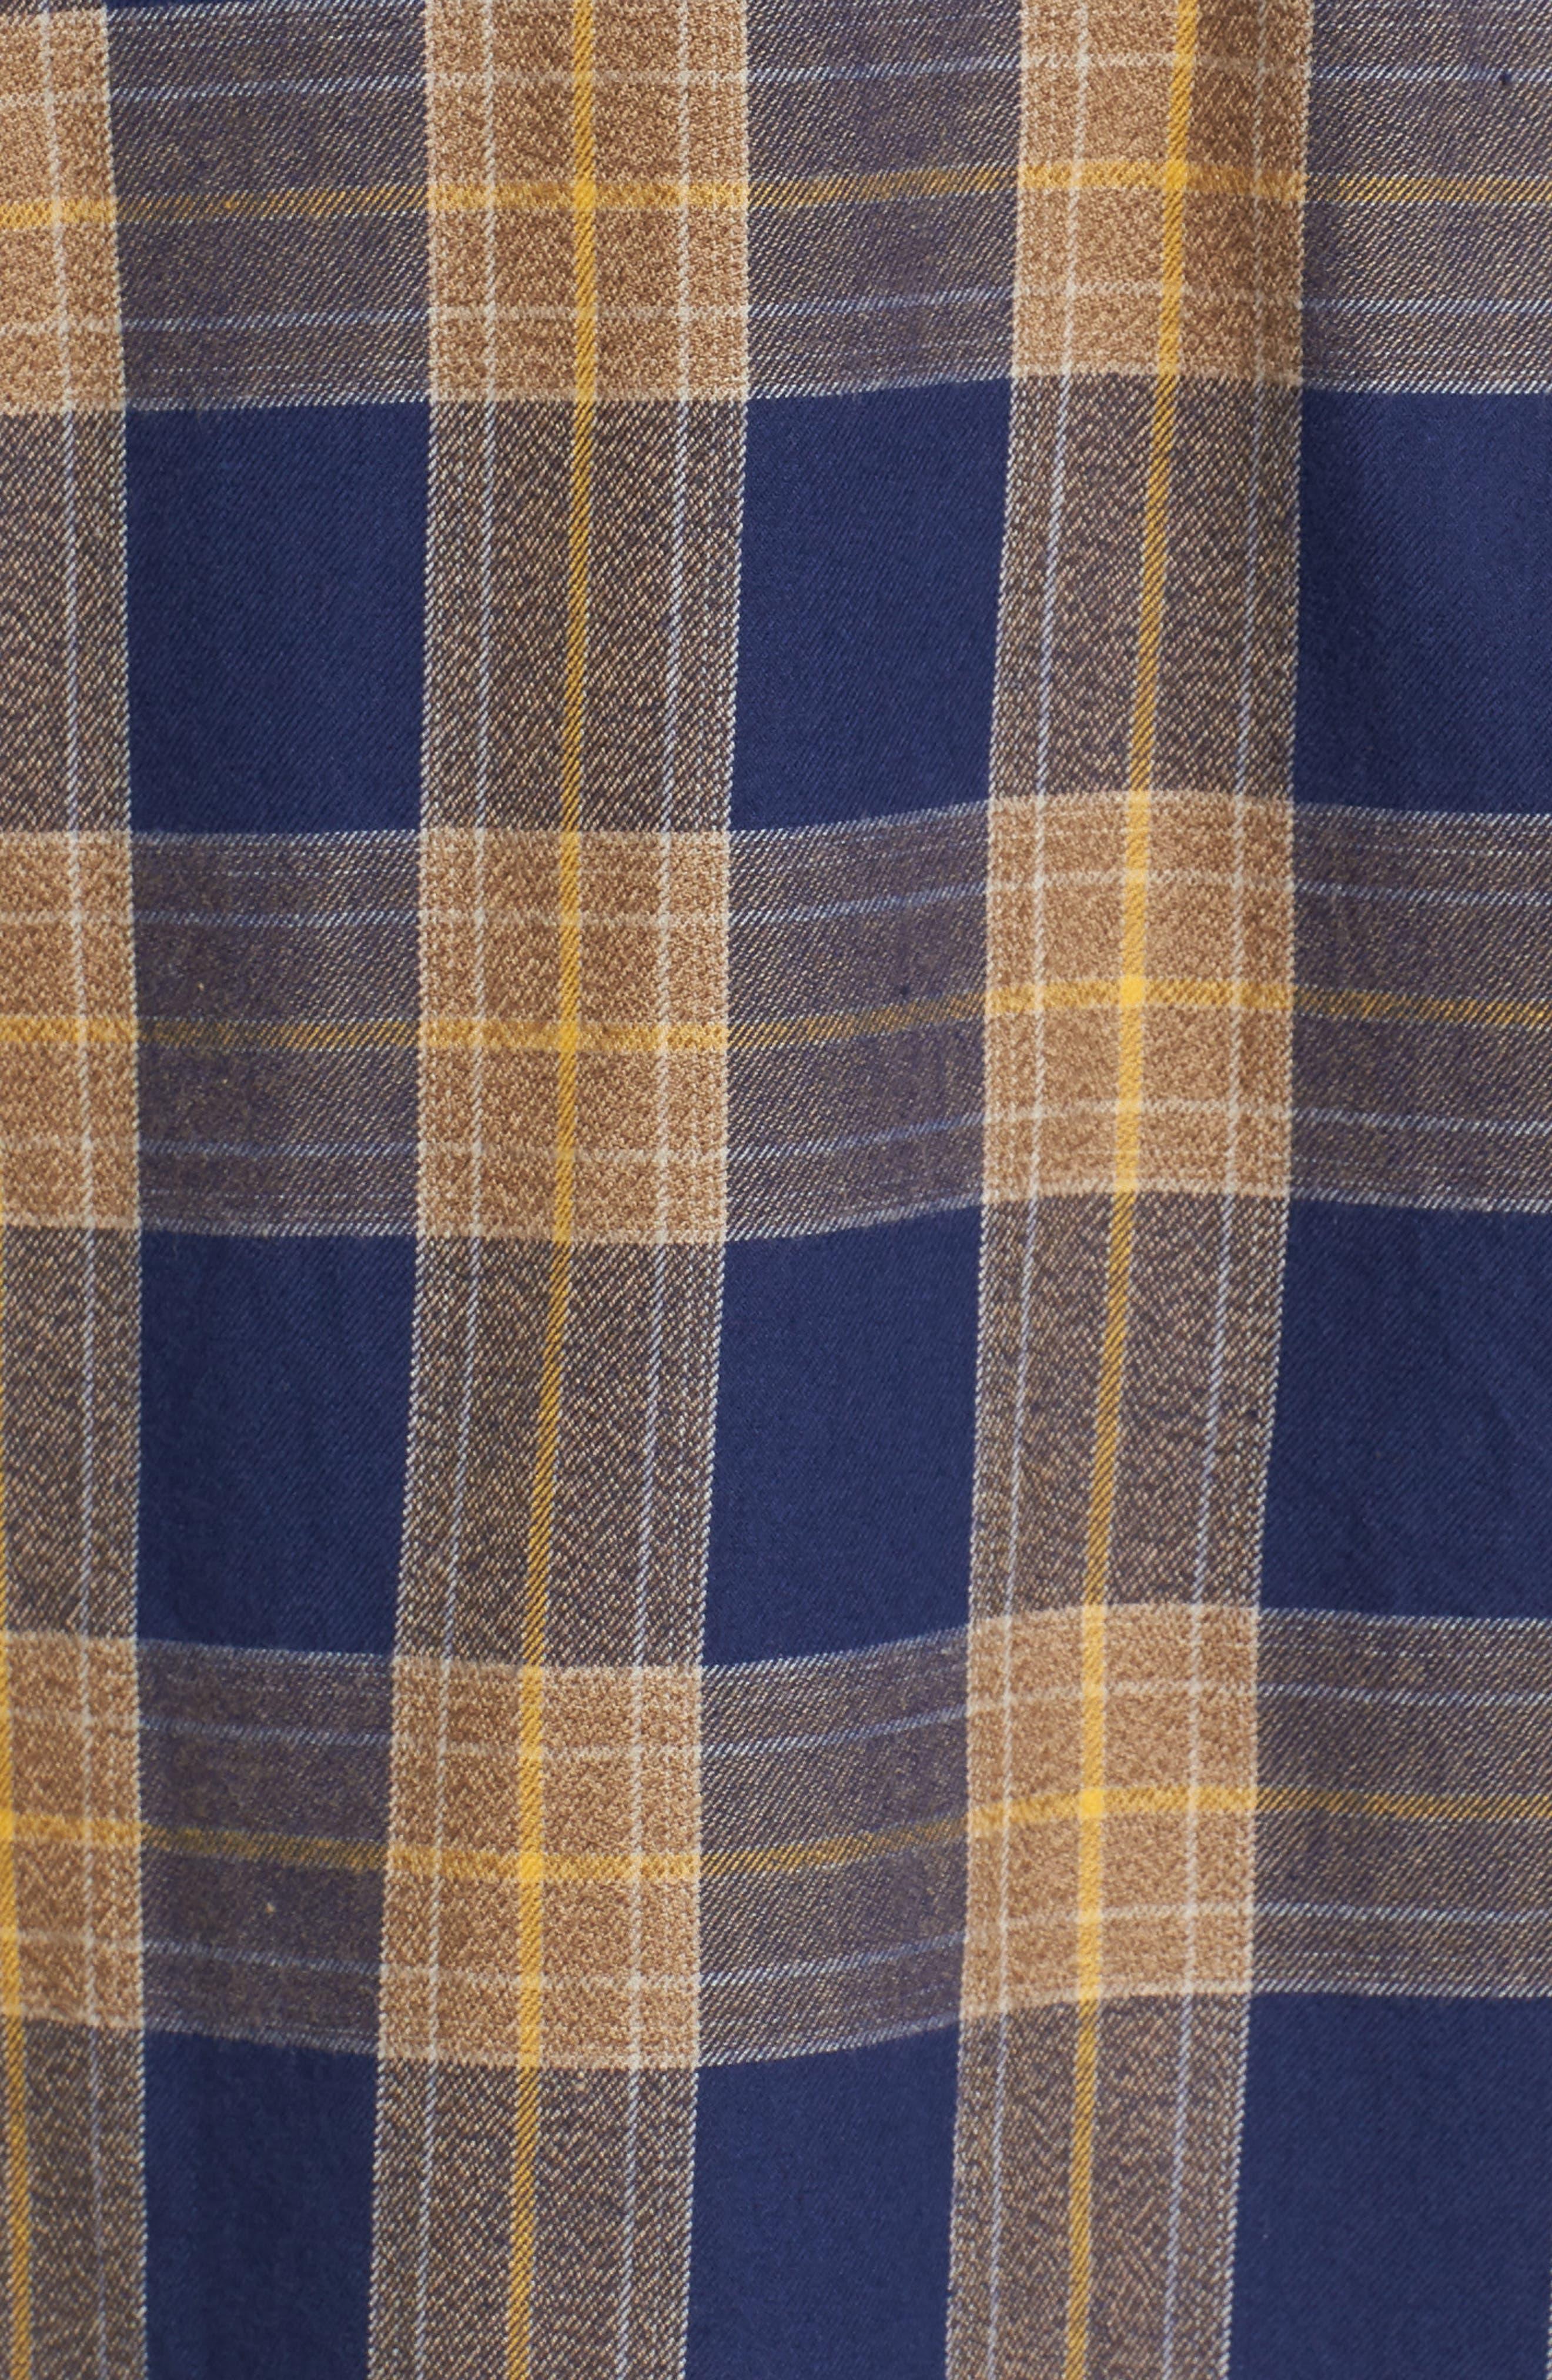 Scotch & Sode Brushed Cotton Shirt,                             Alternate thumbnail 5, color,                             Blue